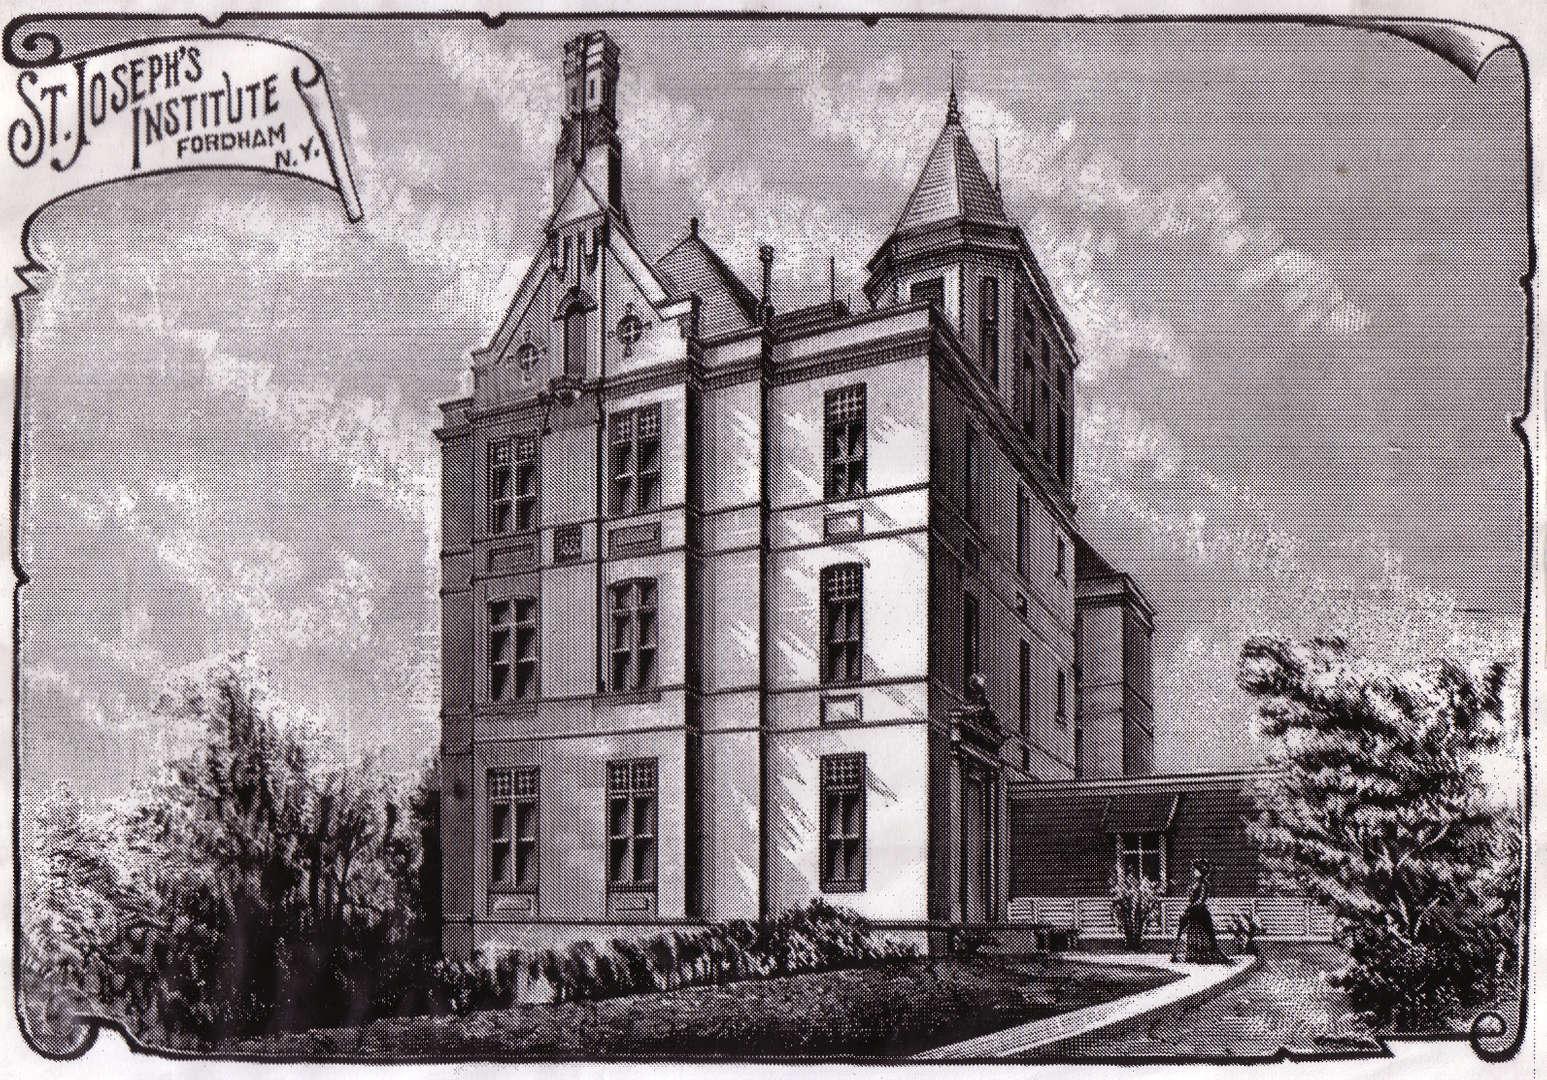 St. Joseph's former Fordham location